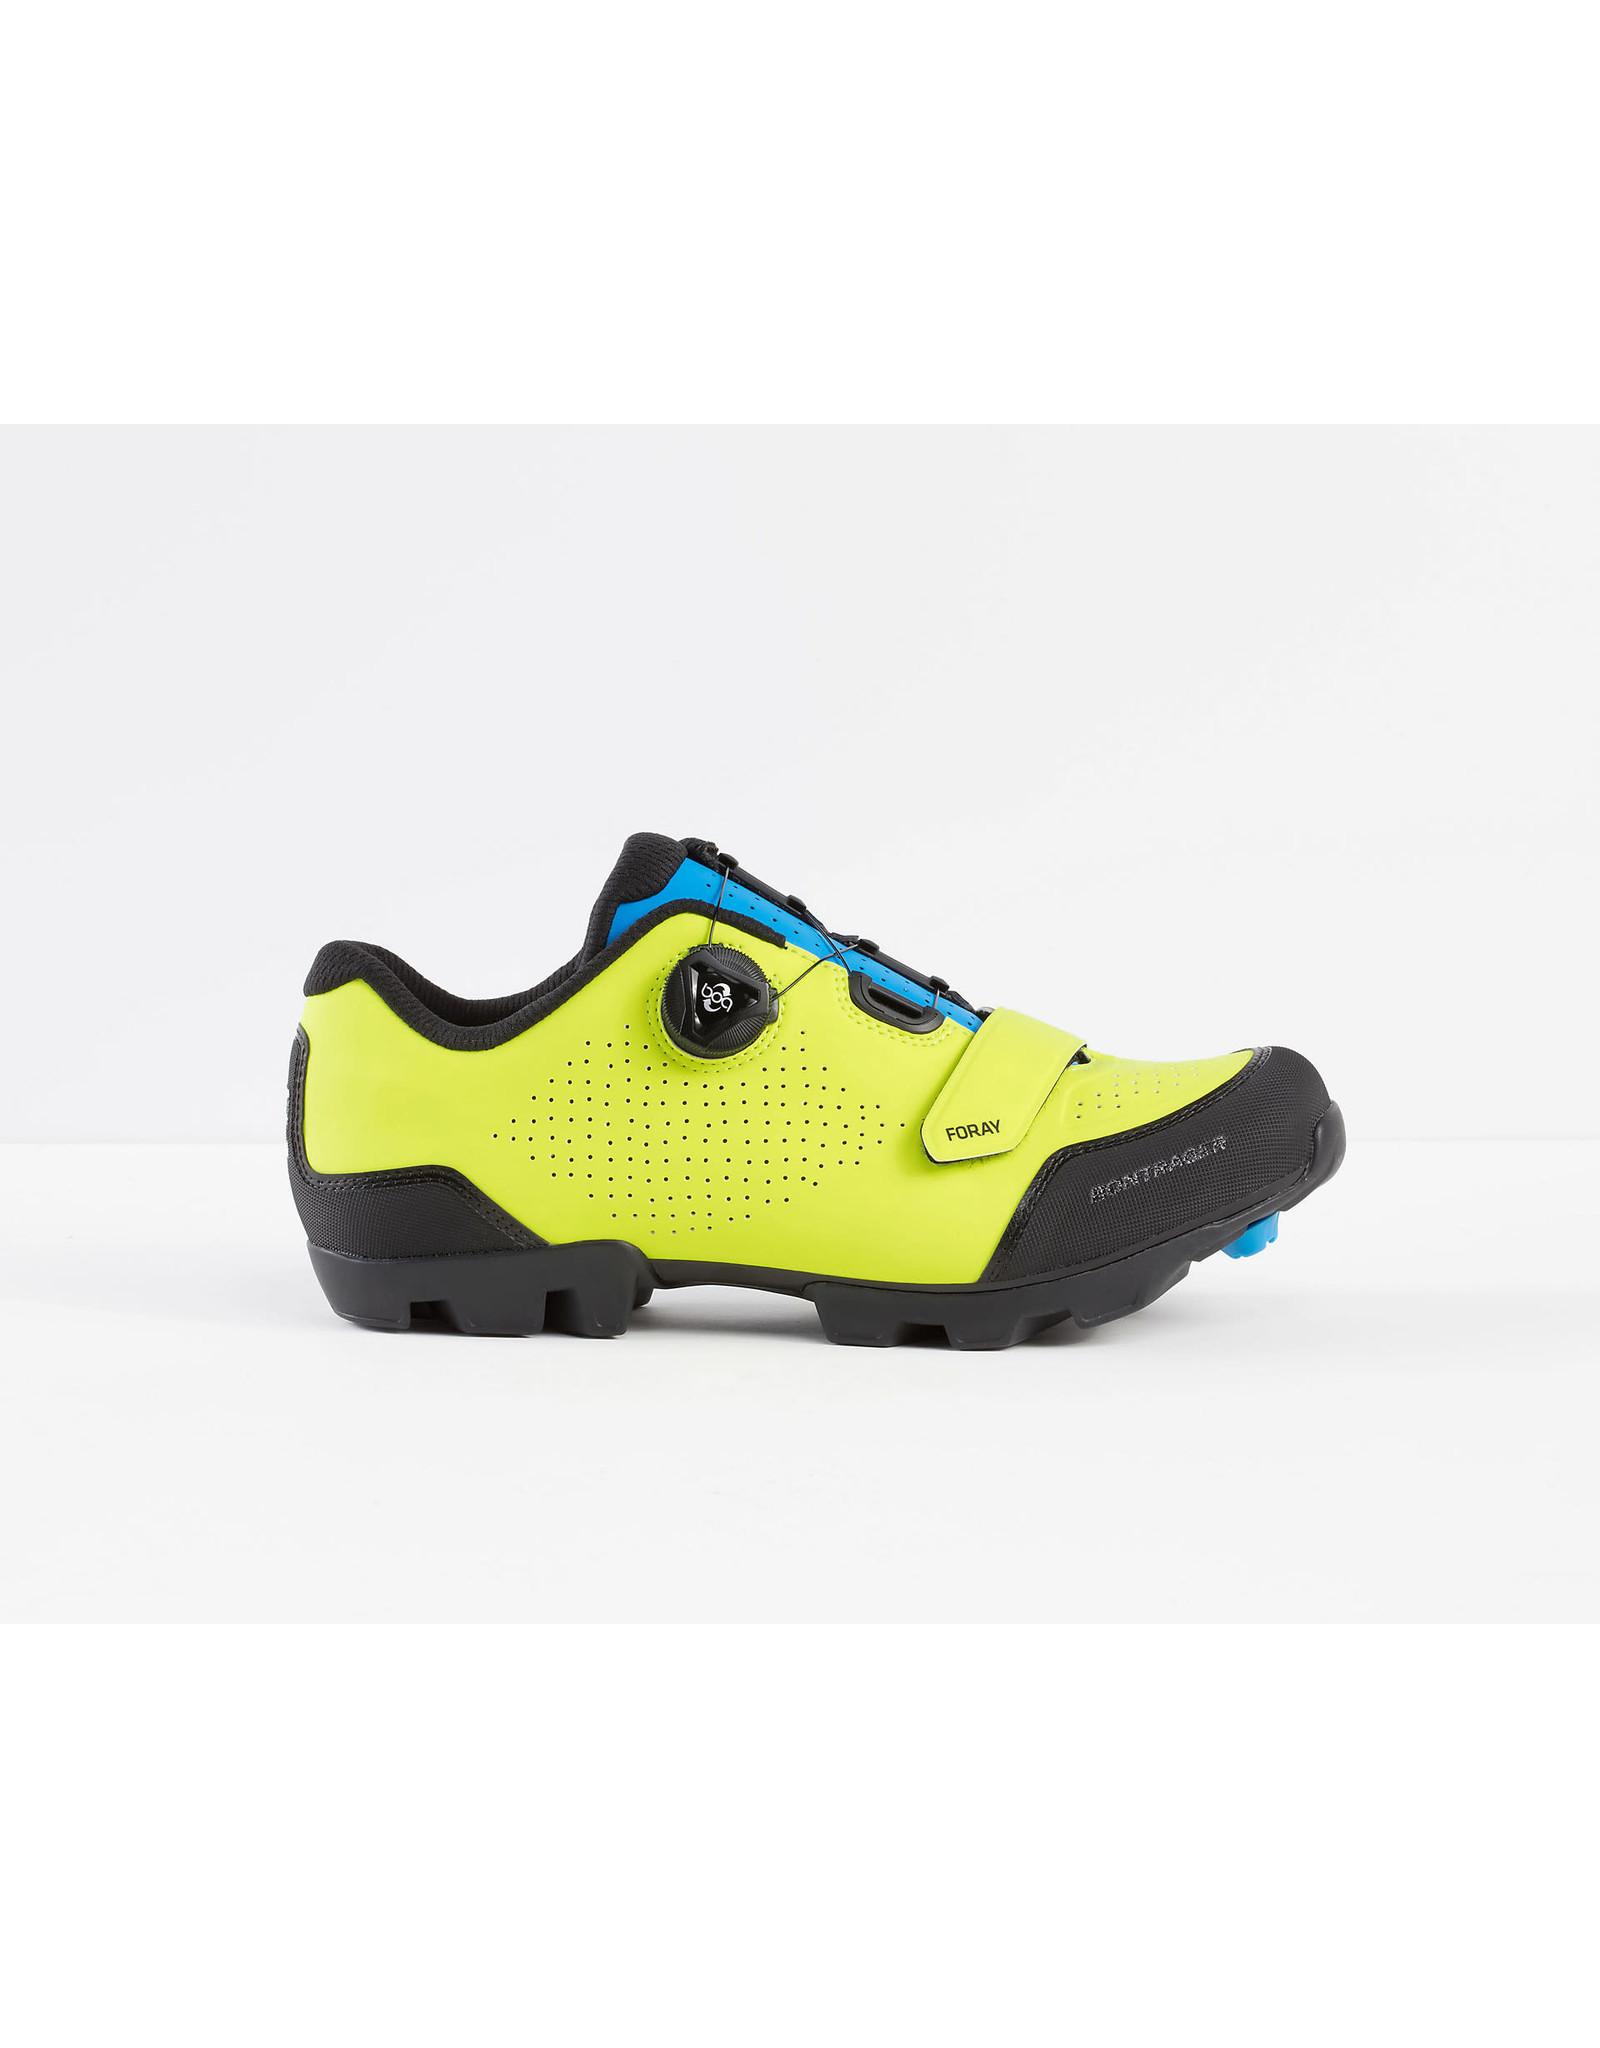 Bontrager Chaussures de VTT Bontrager Foray